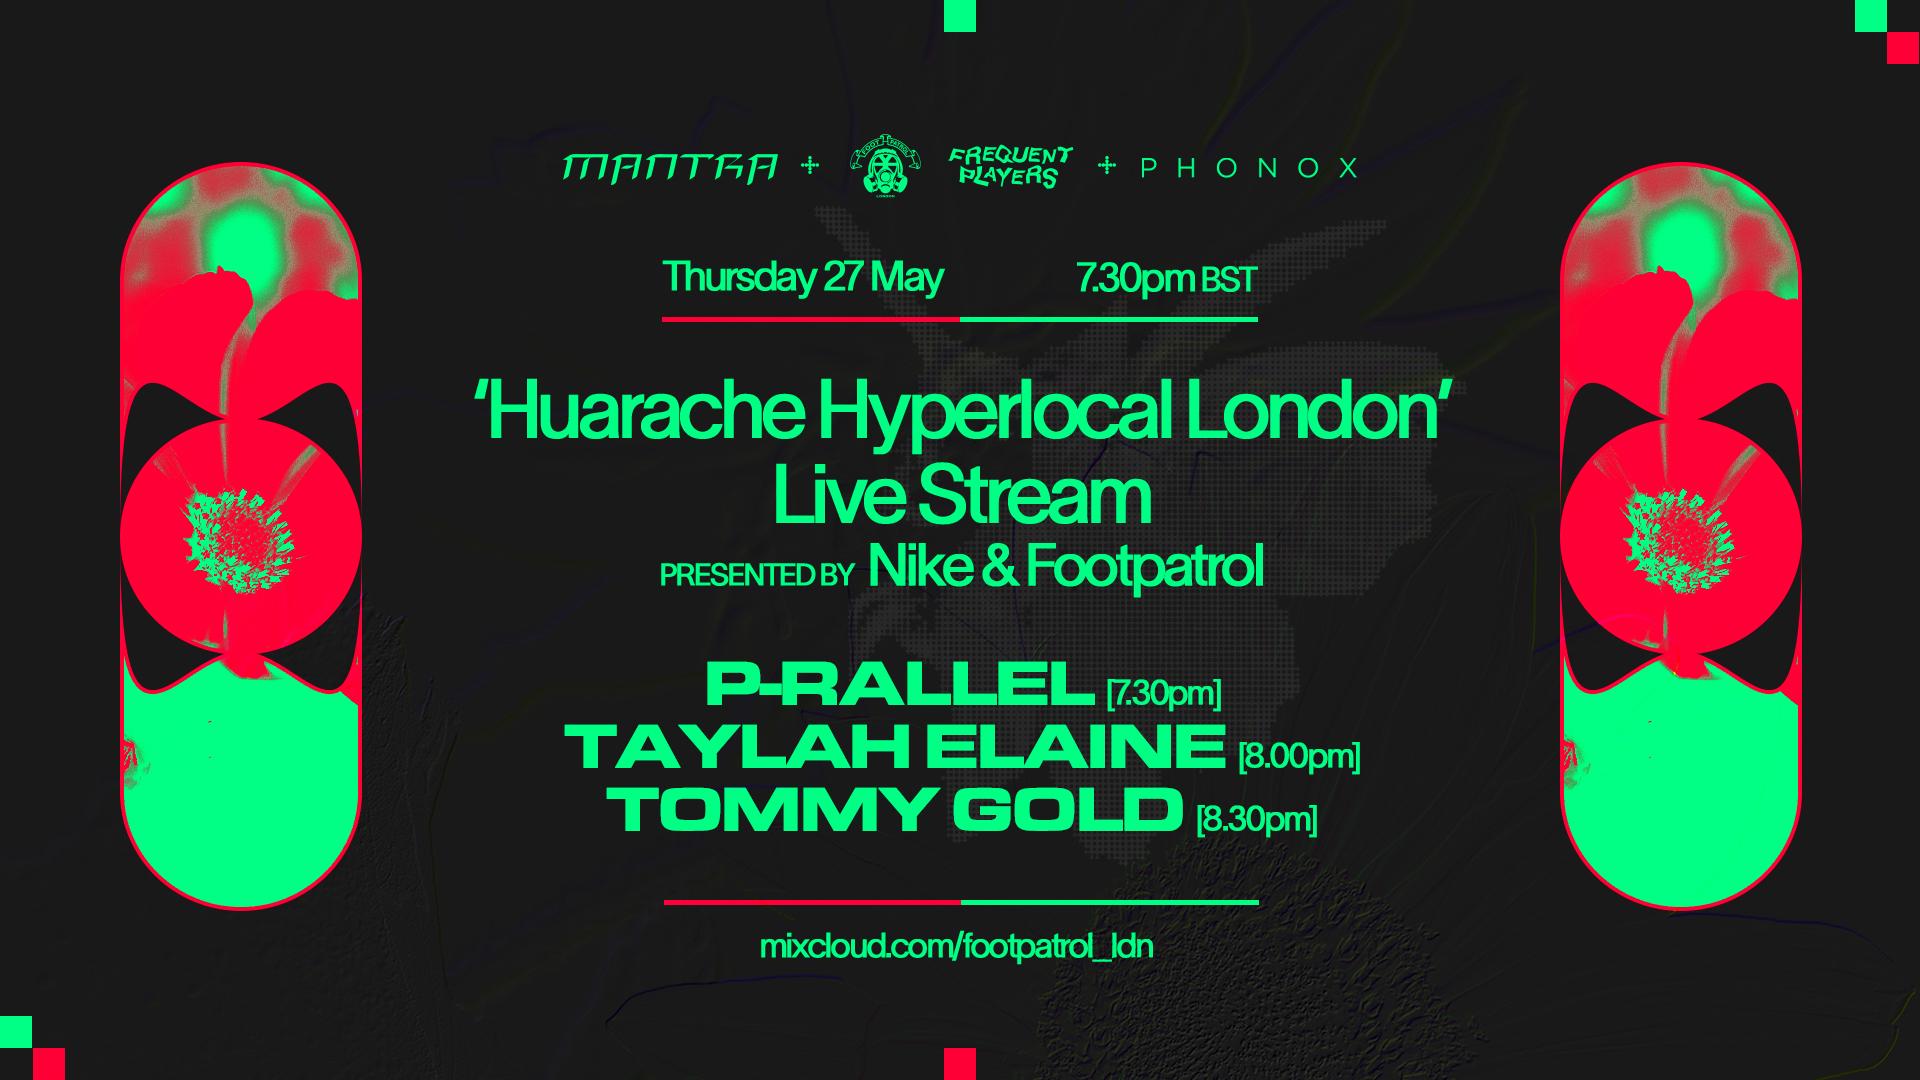 Nike Air Huarache 'Hyperlocal London' with Mantra, Phonox!